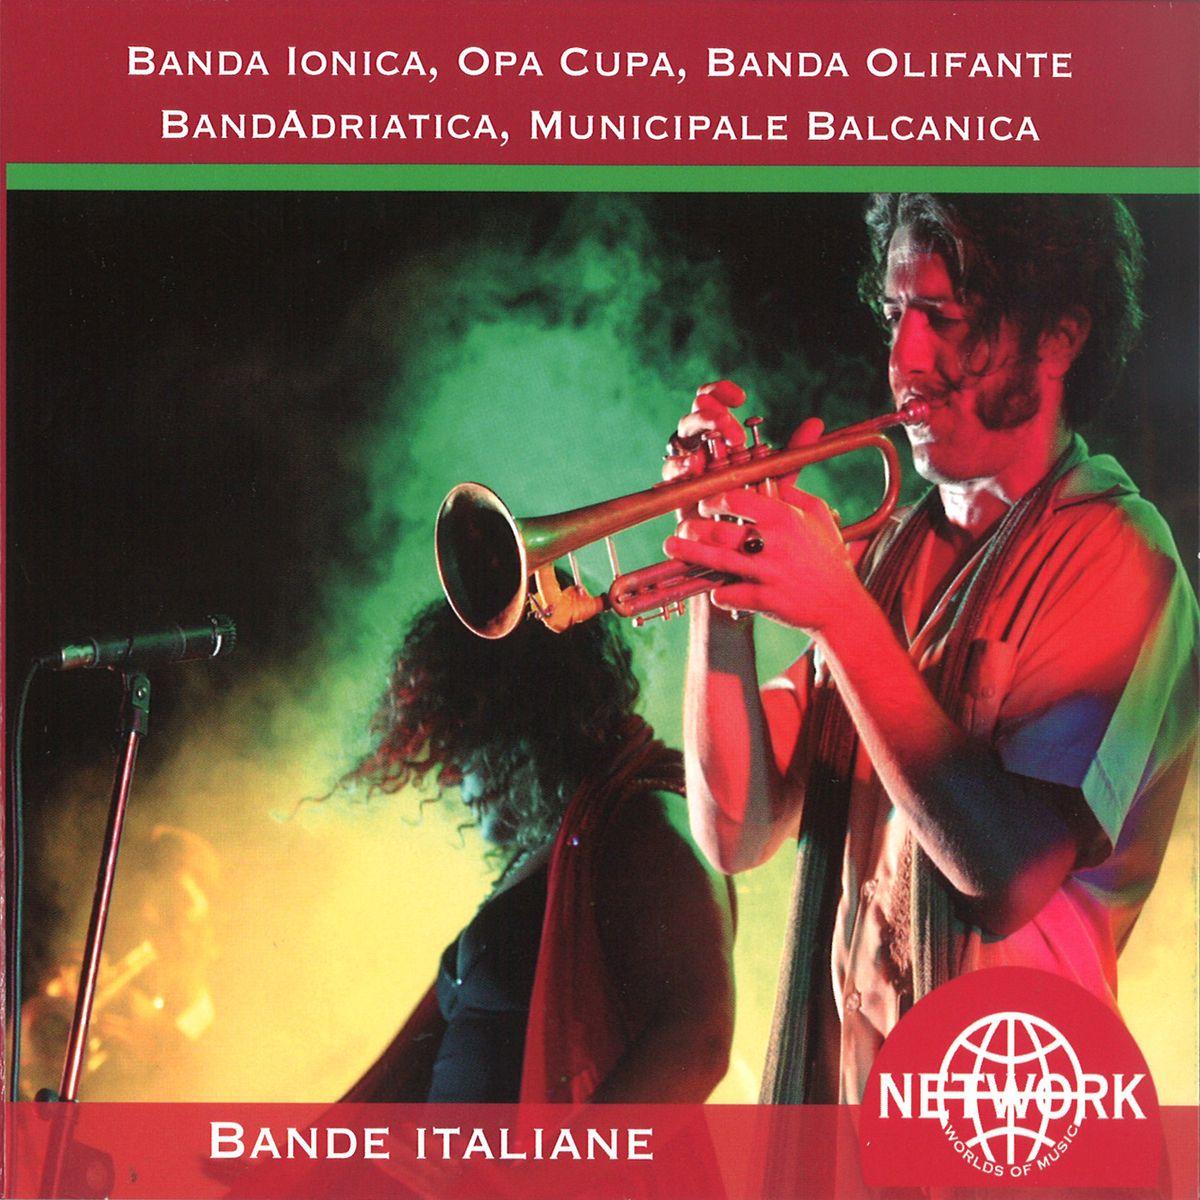 Banda Ionica, Opa Cupa, Banda Olifante, Bandadriatica, Municipale Balcanica. Bande Italiane недорго, оригинальная цена